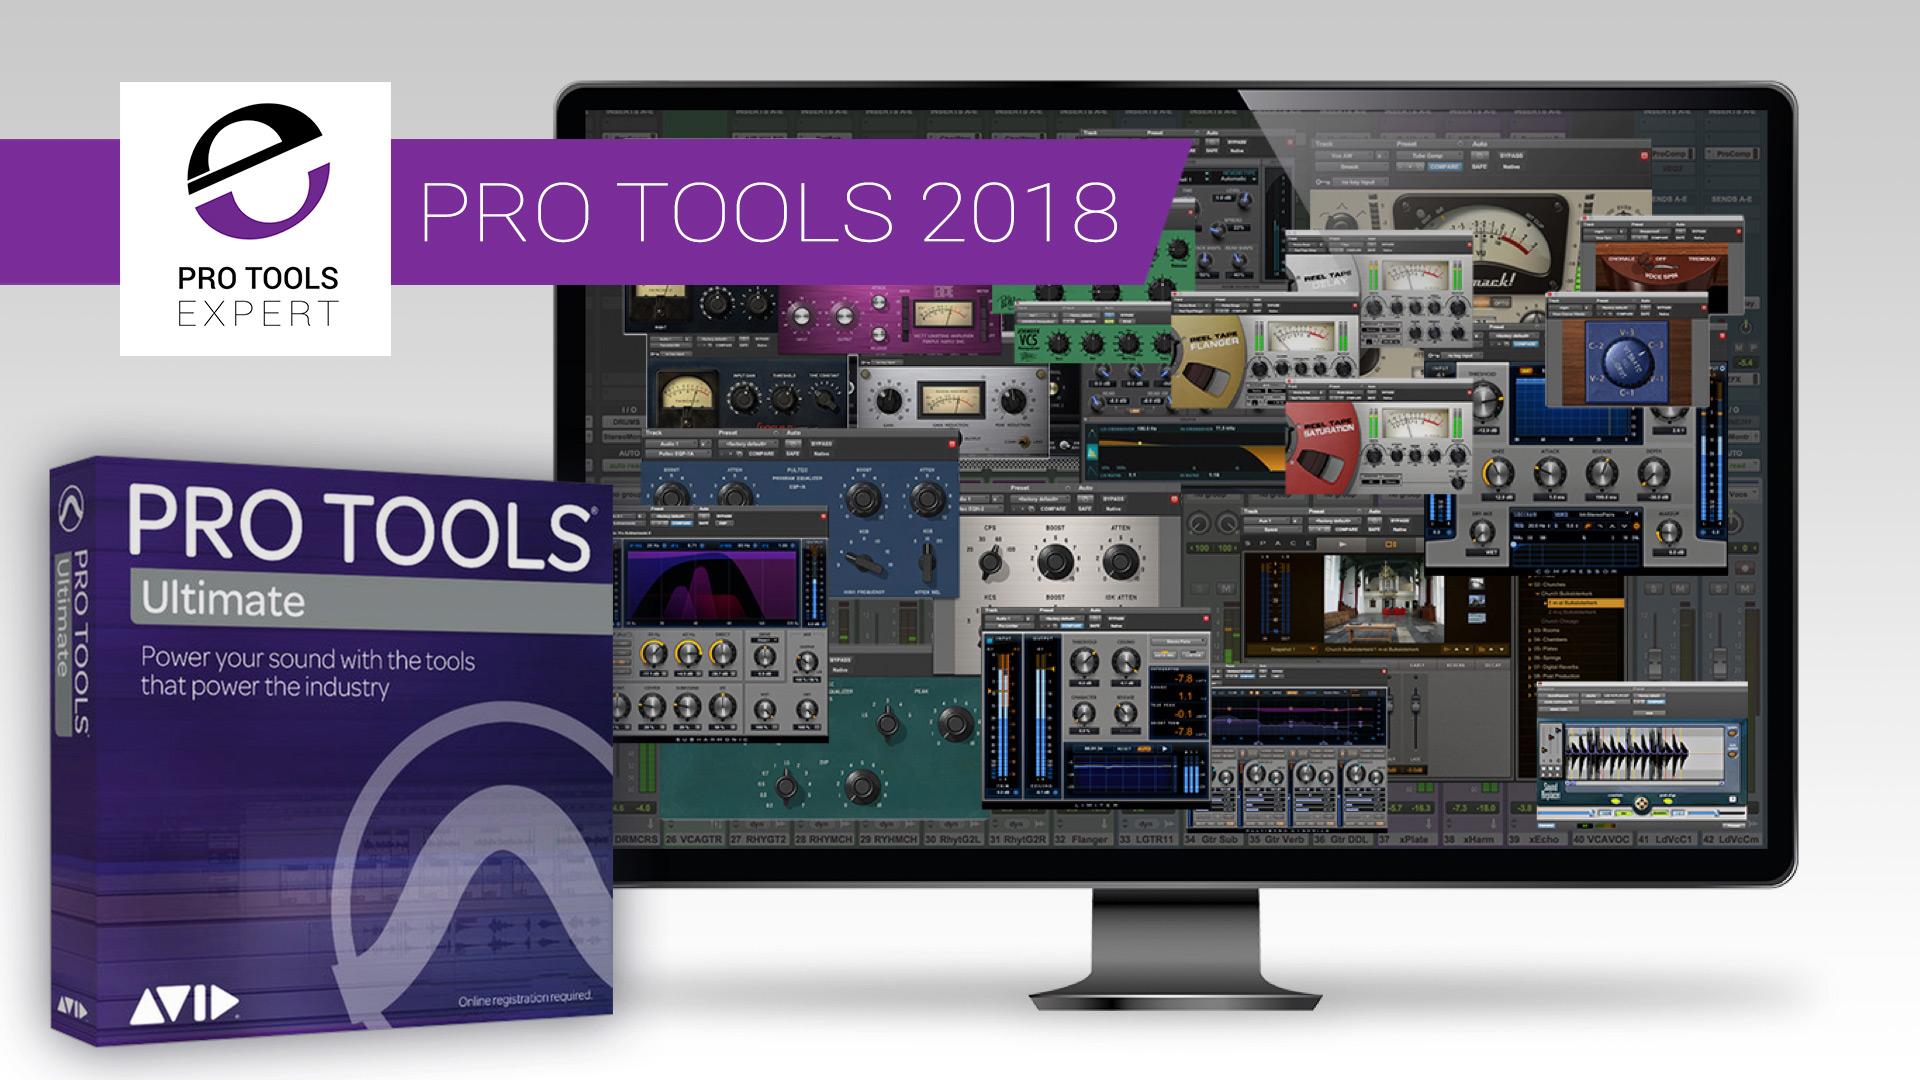 Pro Tools 2018